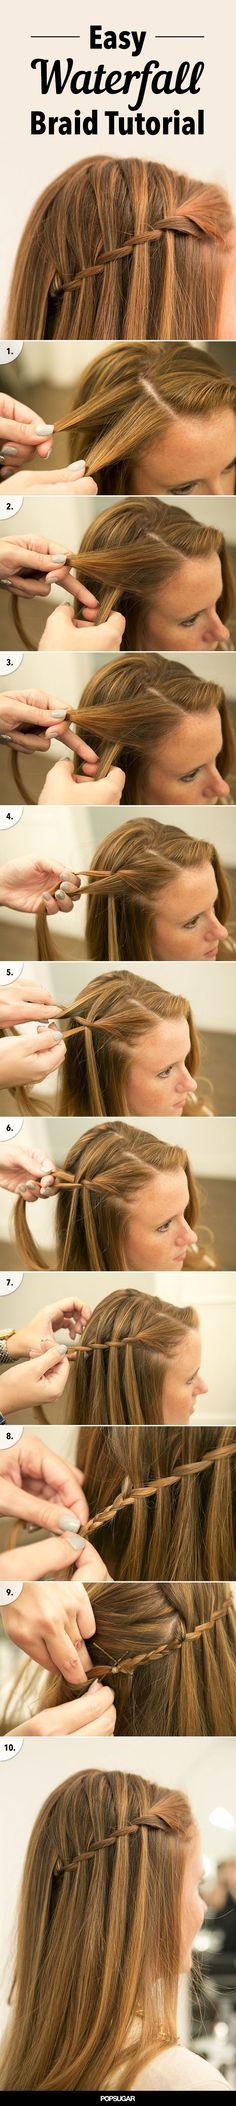 DIY Waterfall Braid long hair braids how to diy hair hairstyles hair tutorials easy hairstyles